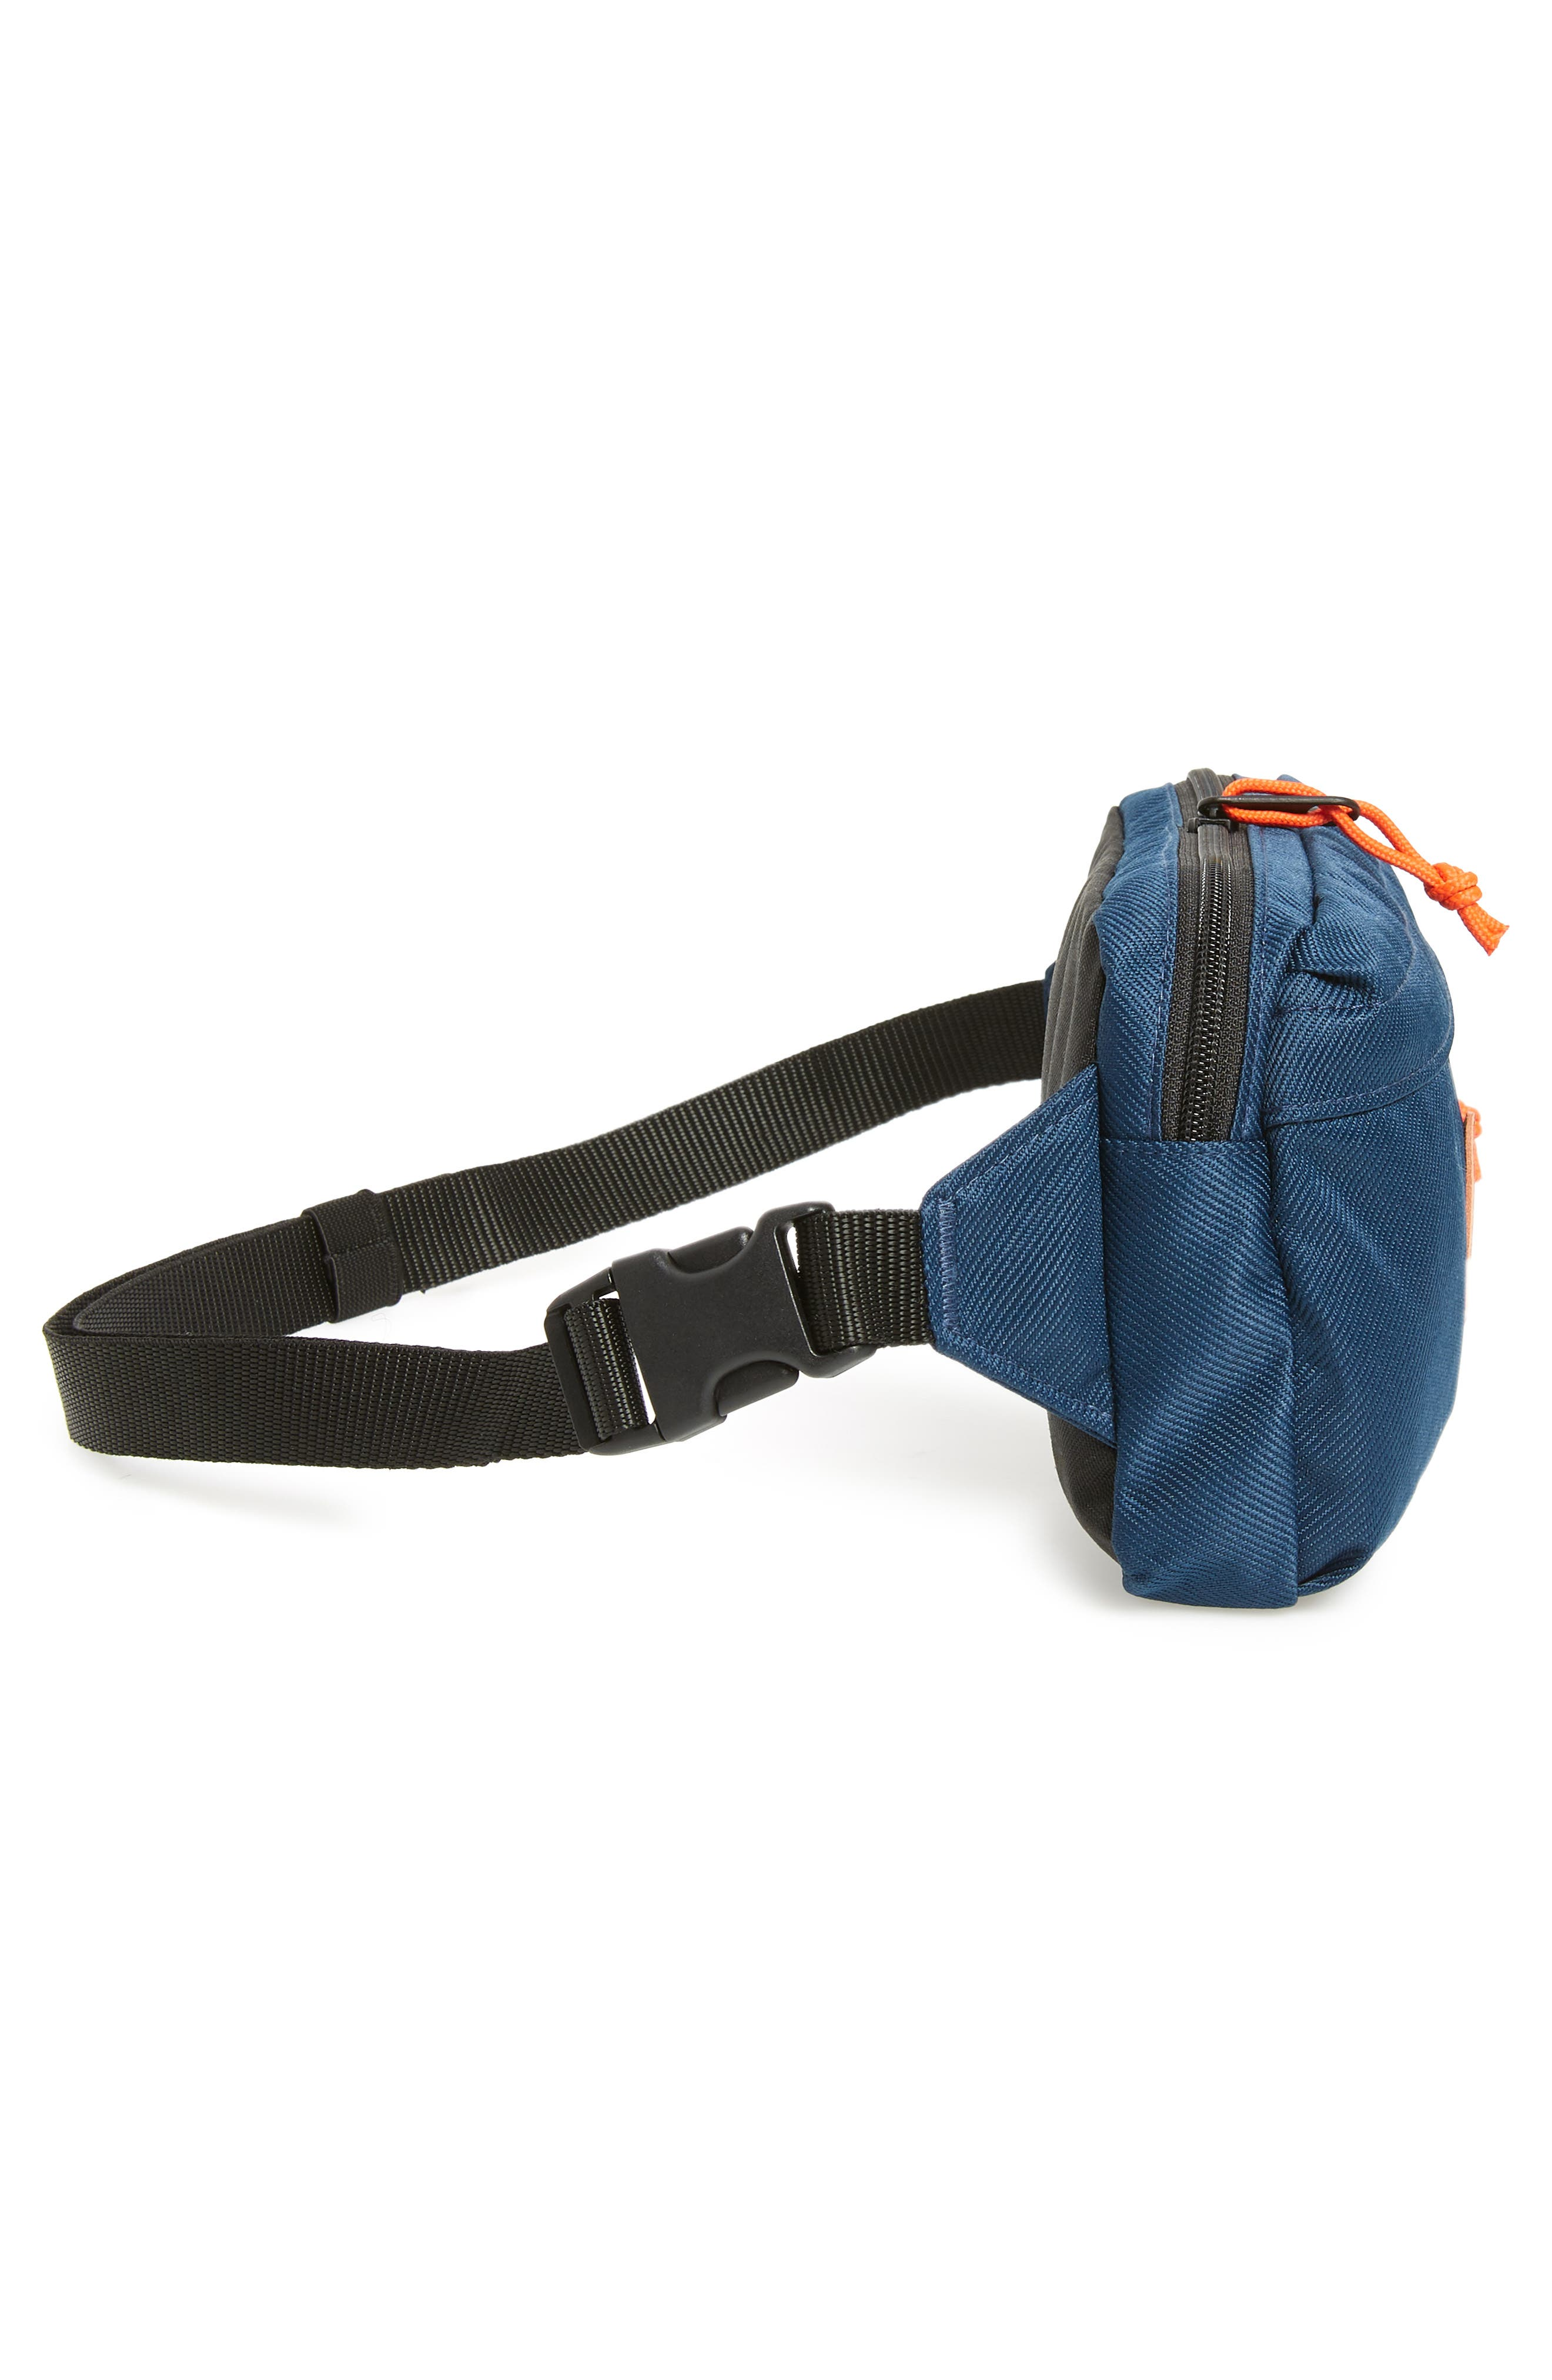 JANSPORT WAISTED BELT BAG - BLUE, NAVY TWILL